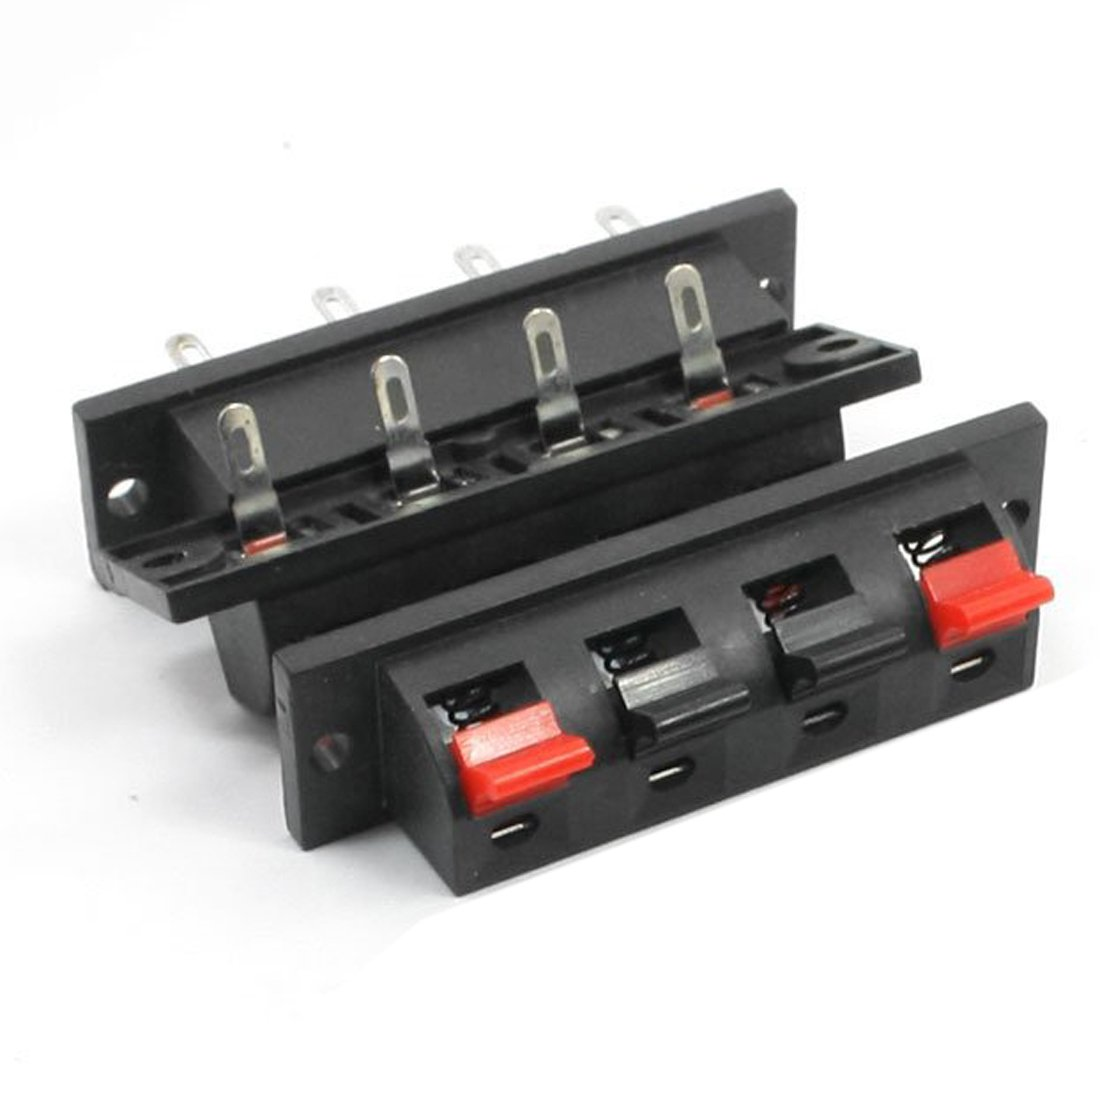 SODIAL(R) Single Row 4 Pin 4 Position Speaker Terminal Board Connectors 5 Pcs